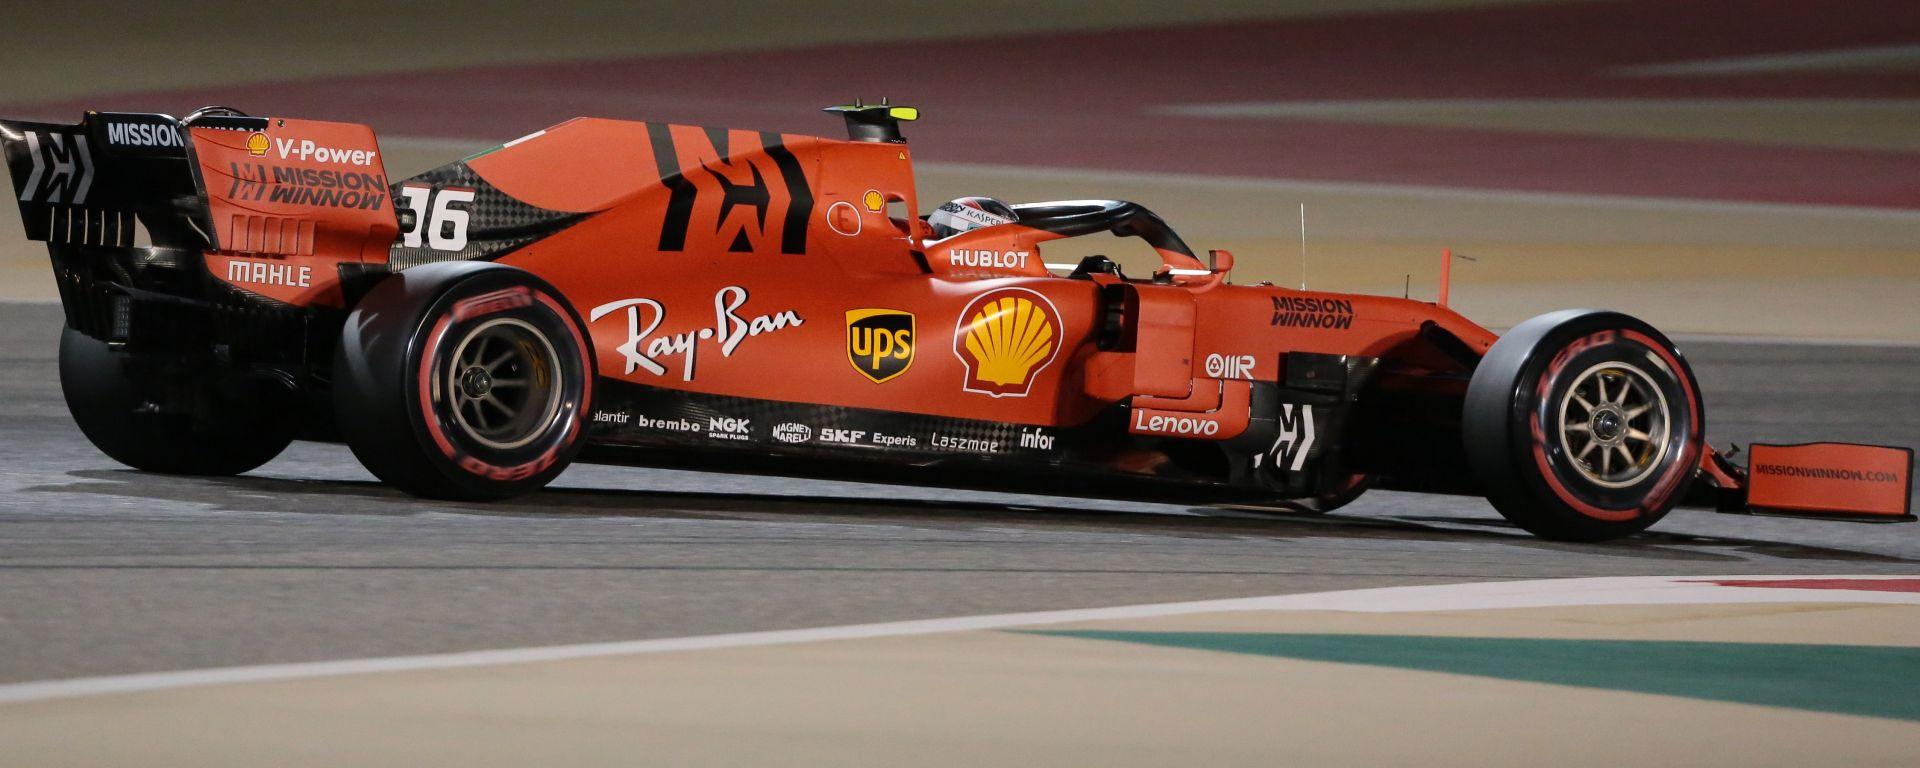 Charles Leclerc nei primi giri del Gp Bahrain 2019